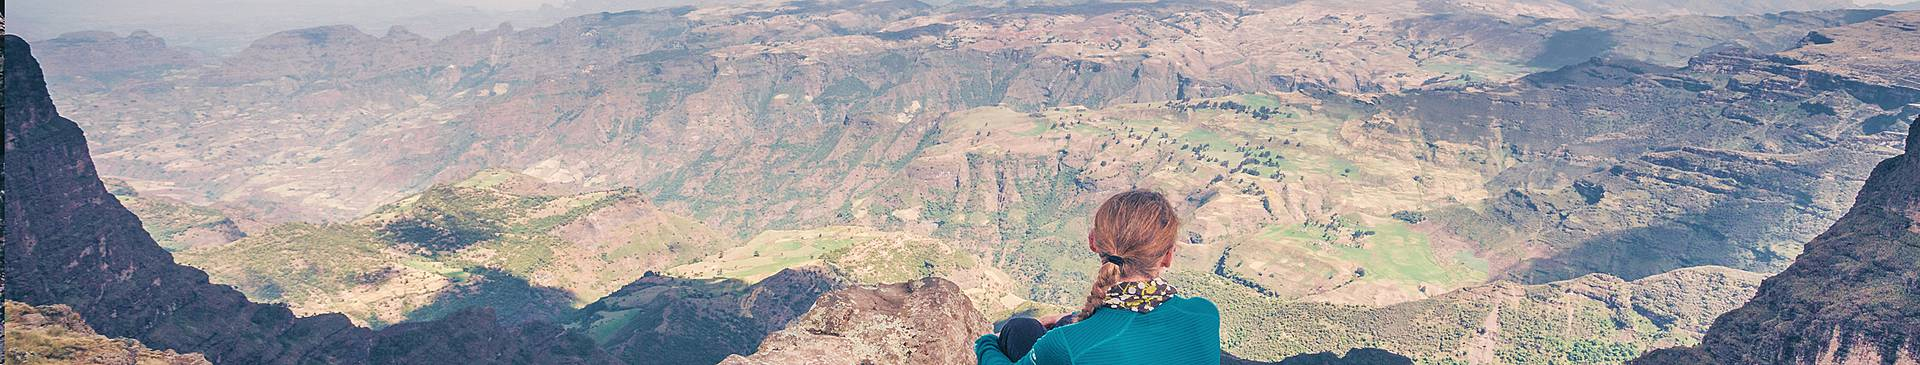 Viaggi in Etiopia in estate